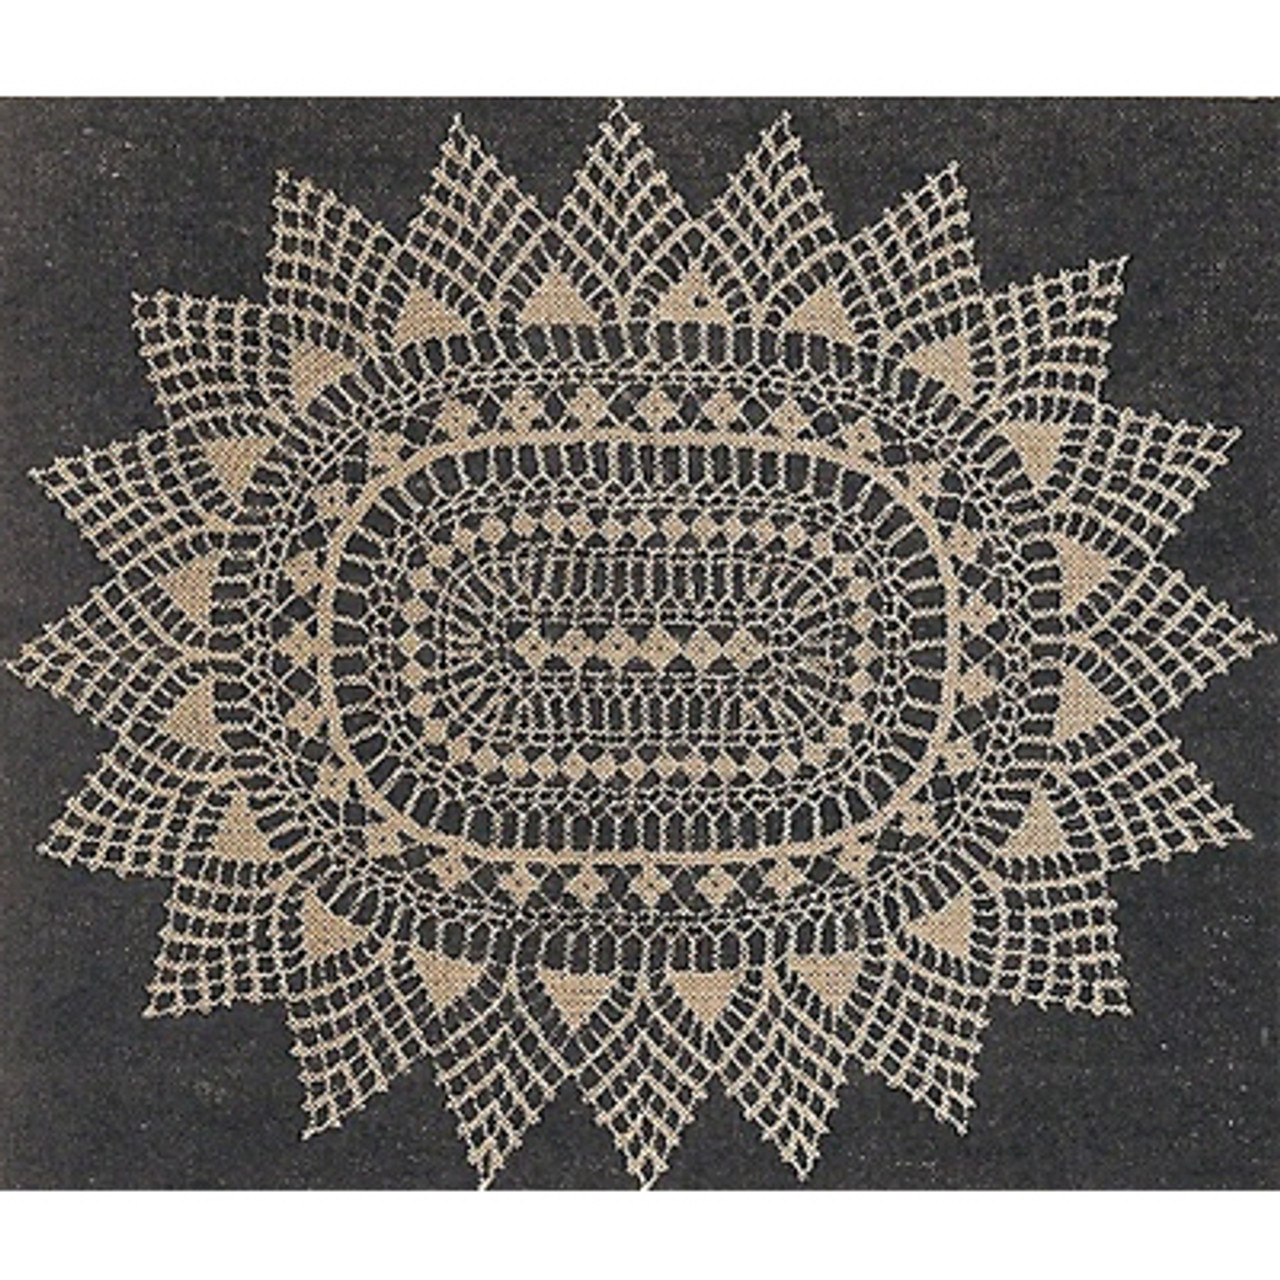 Workbasket Oval Doily Crochet Pattern